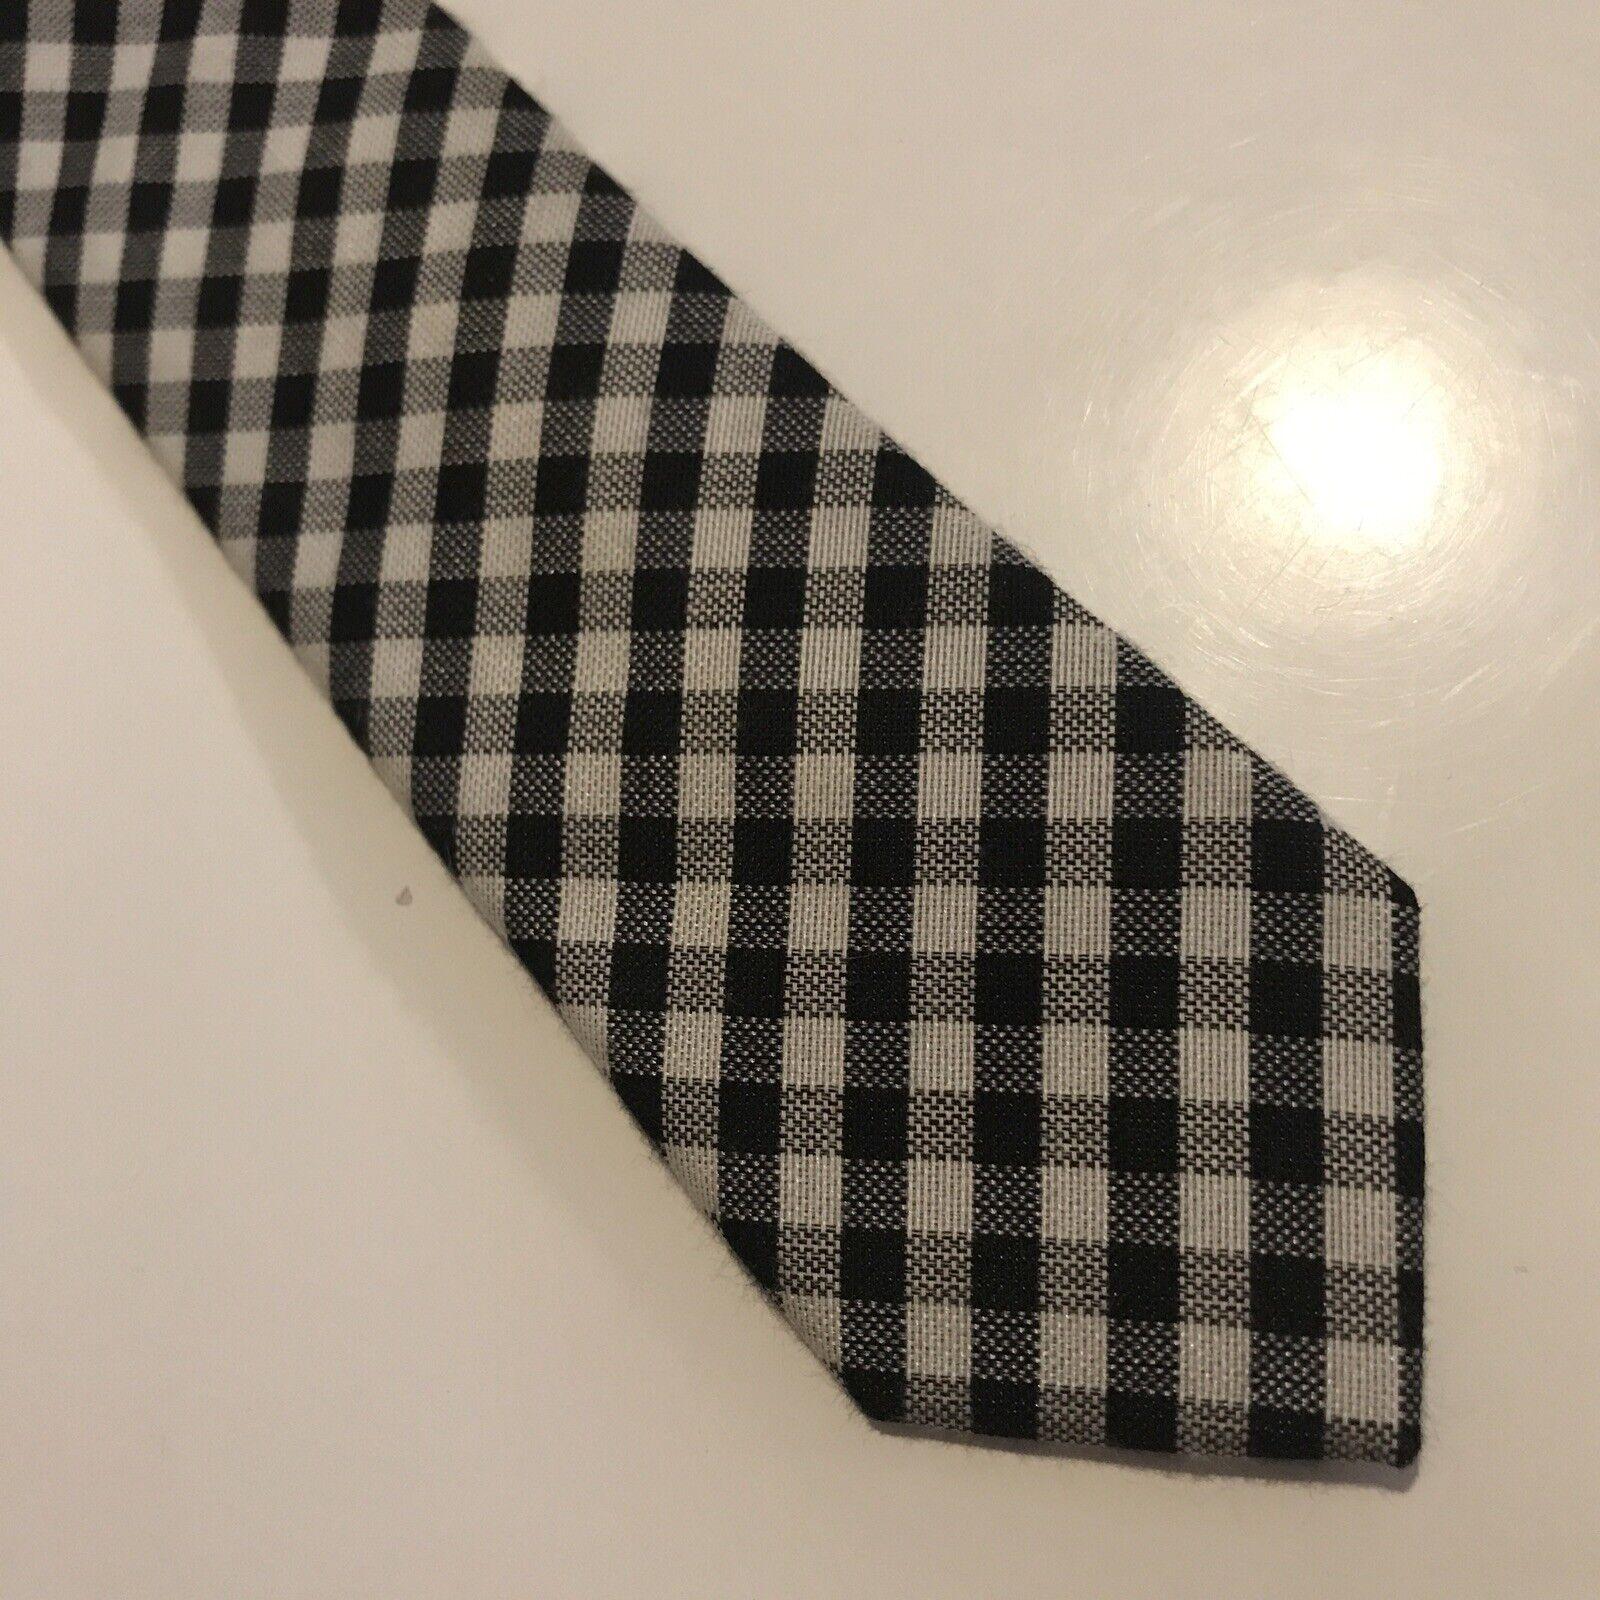 BEN SHERMAN Men's Skinny Tie -39% Poly 61% Cotton - Black White Checkered Design